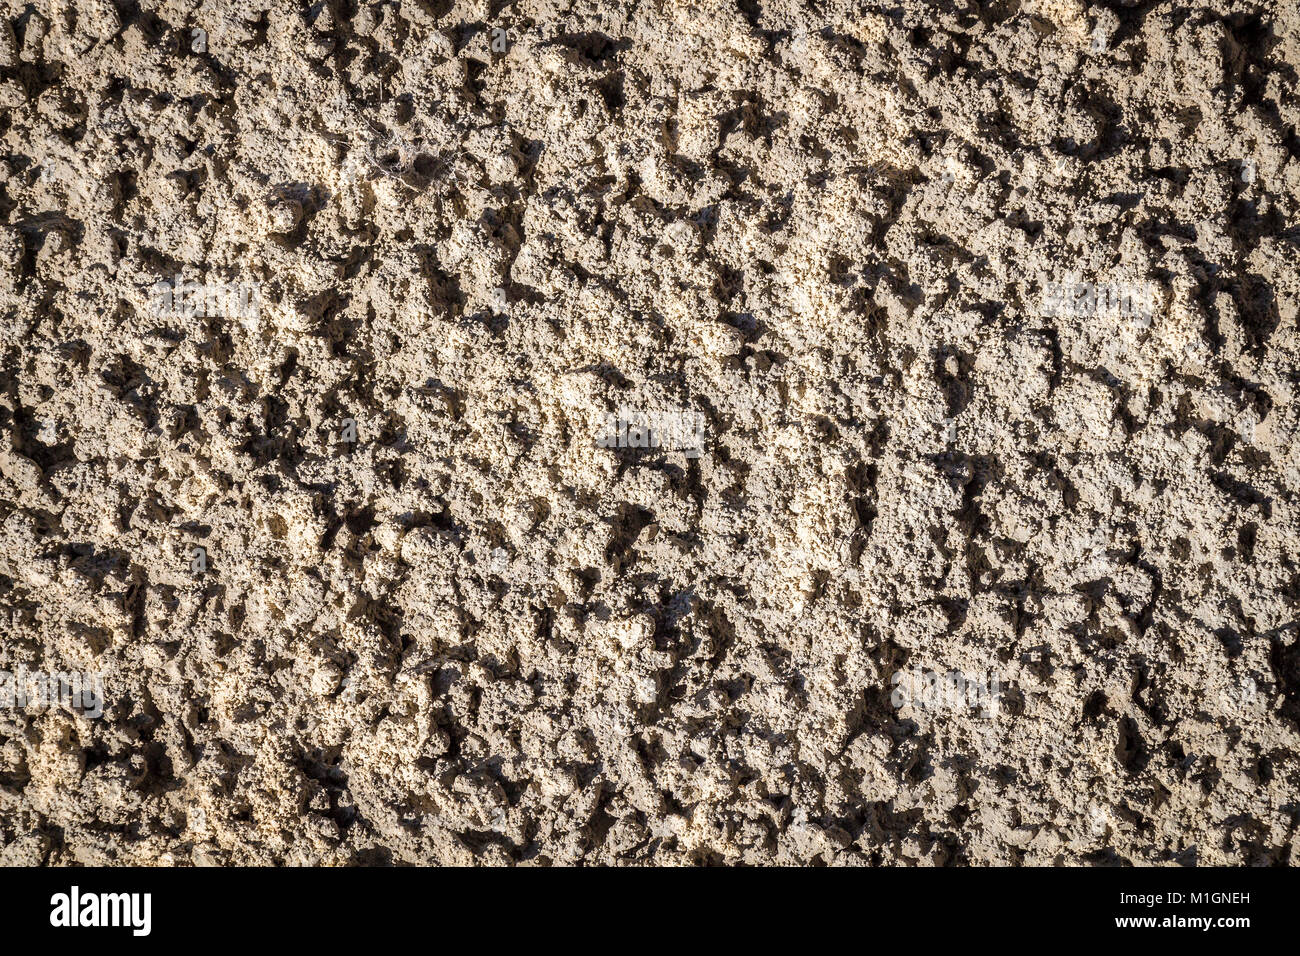 Superficie De Hormigon Decorativo De Un Muro De Cerca Como Fondo - Hormigon-decorativo